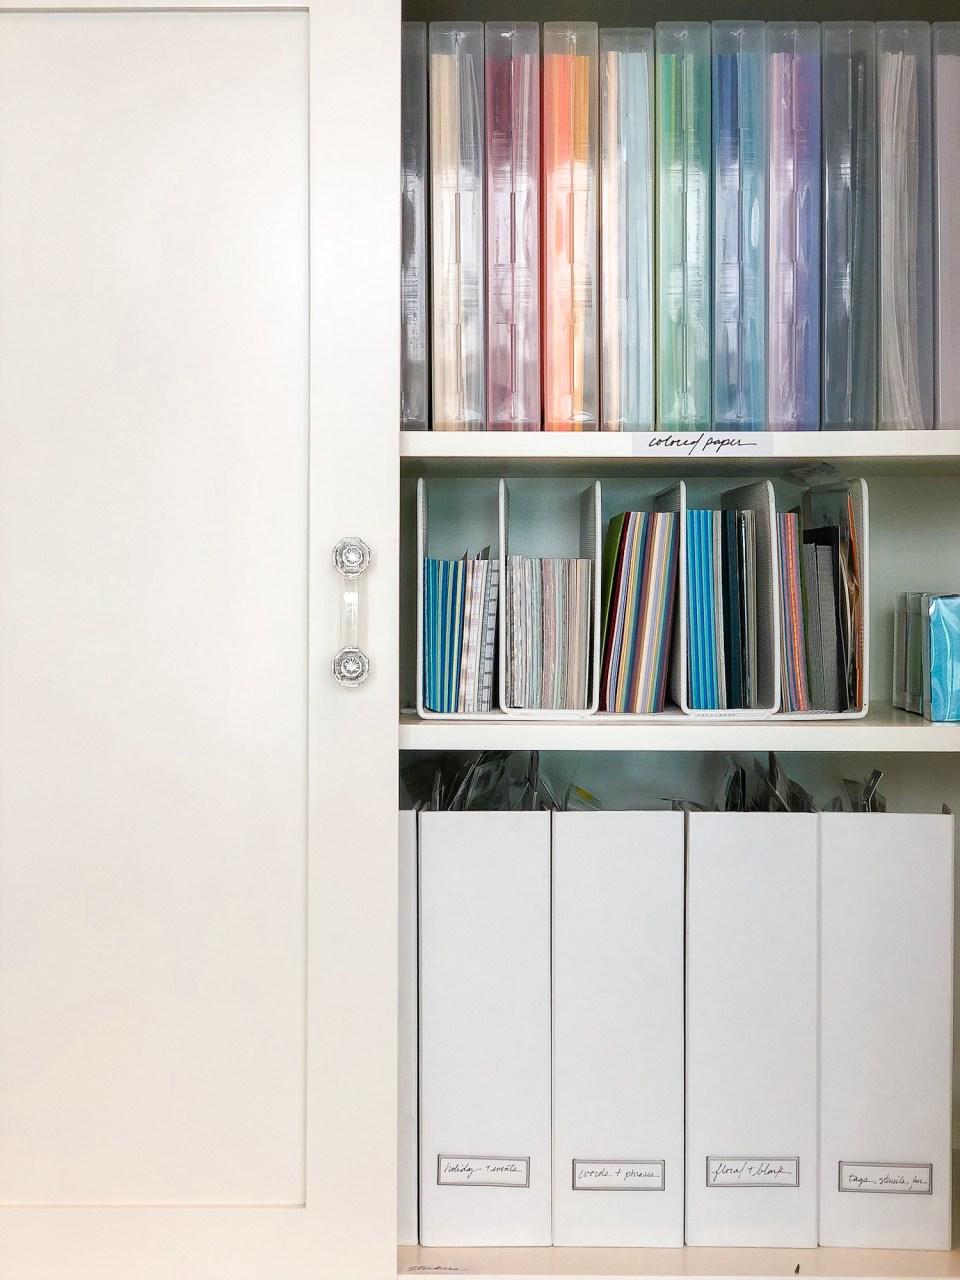 Craft Room Ideas: 14 Organizing Tips for Crafters // Art Supply organizer, Craft room storage, Craft room organization, Craft closet, Scrapbooking Organizing